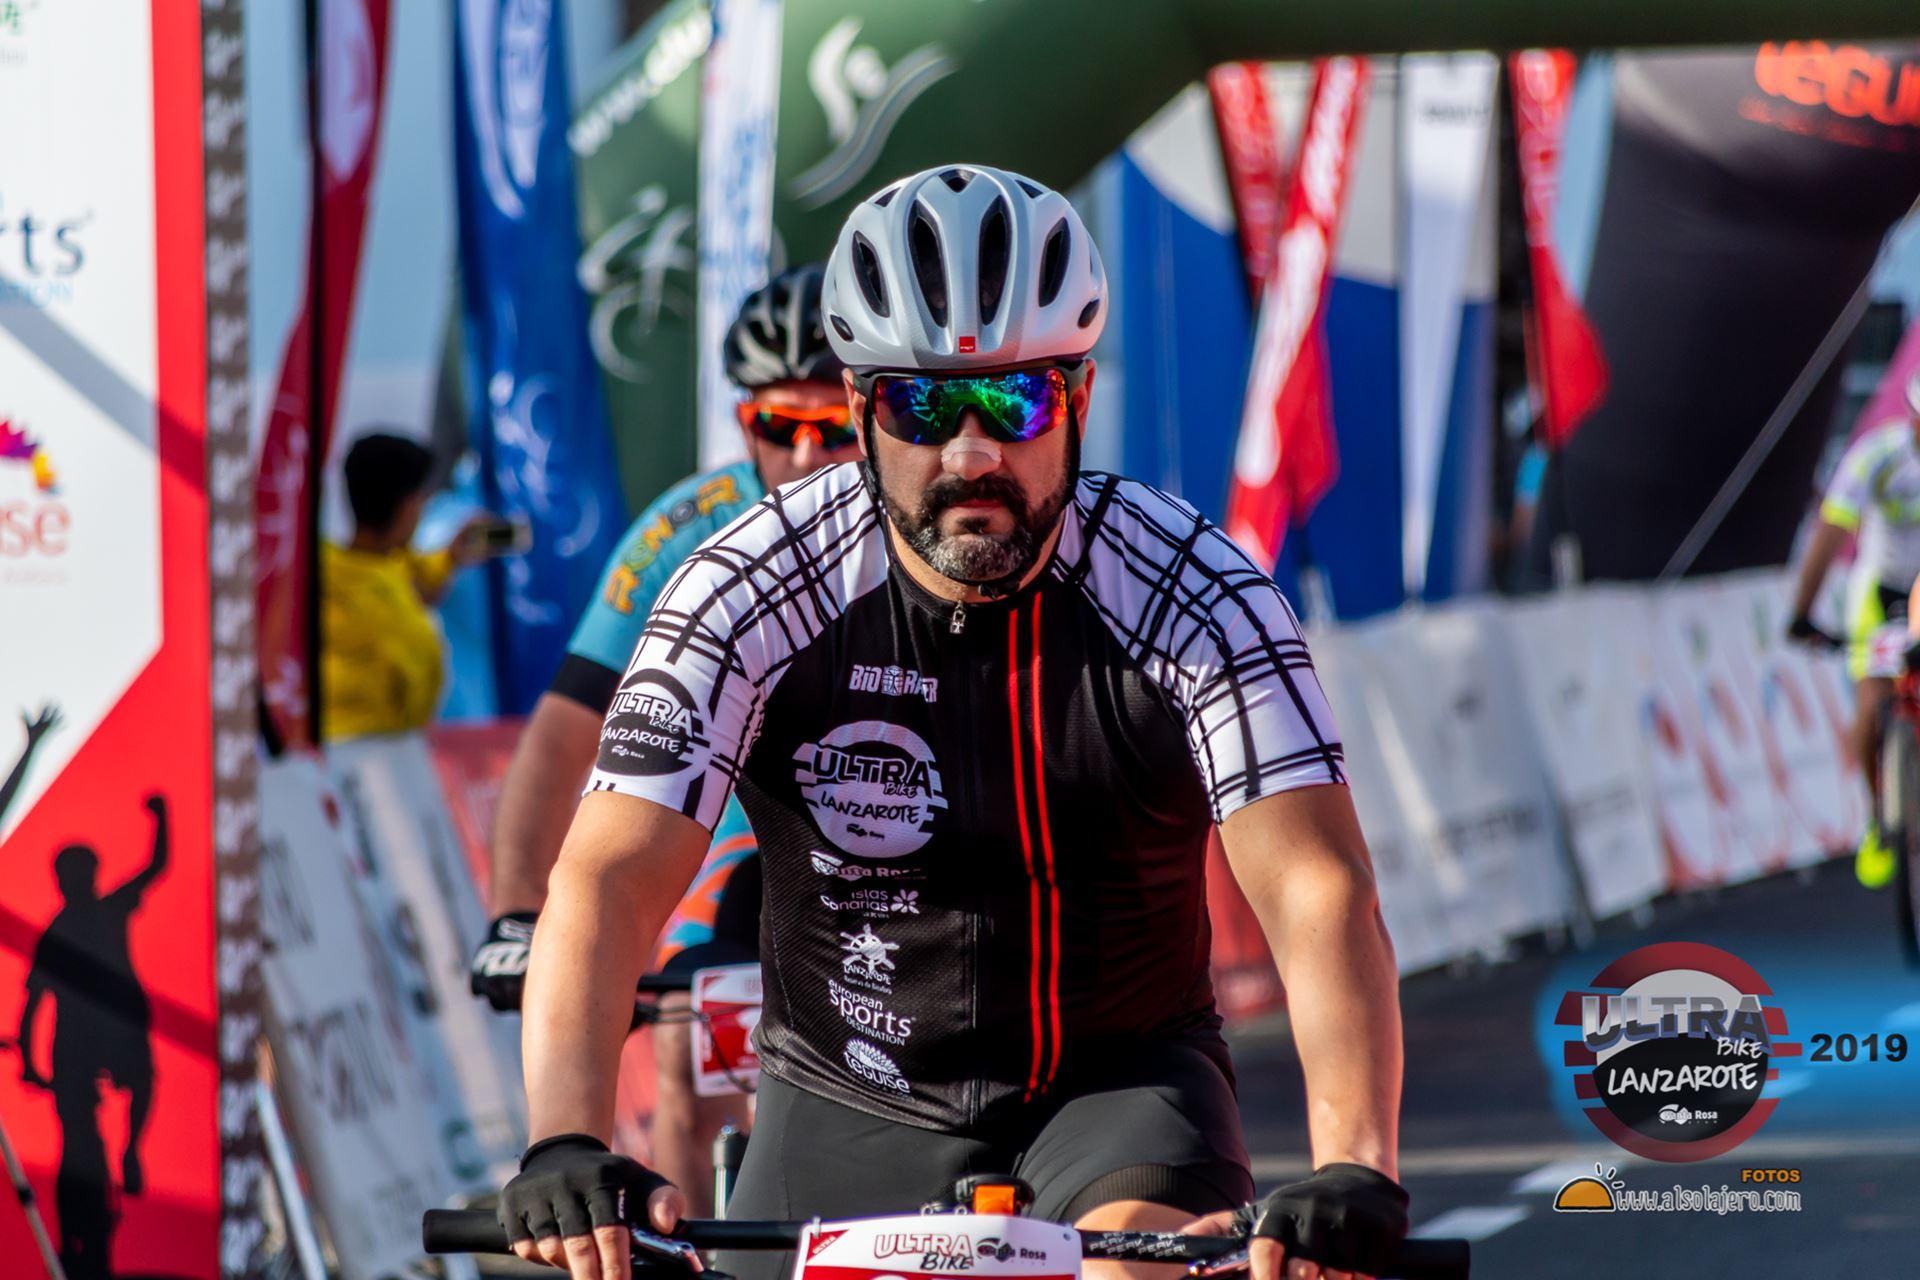 Salida 2ª Etapa Ultrabike 2019 Fotos Alsolajero.com-58